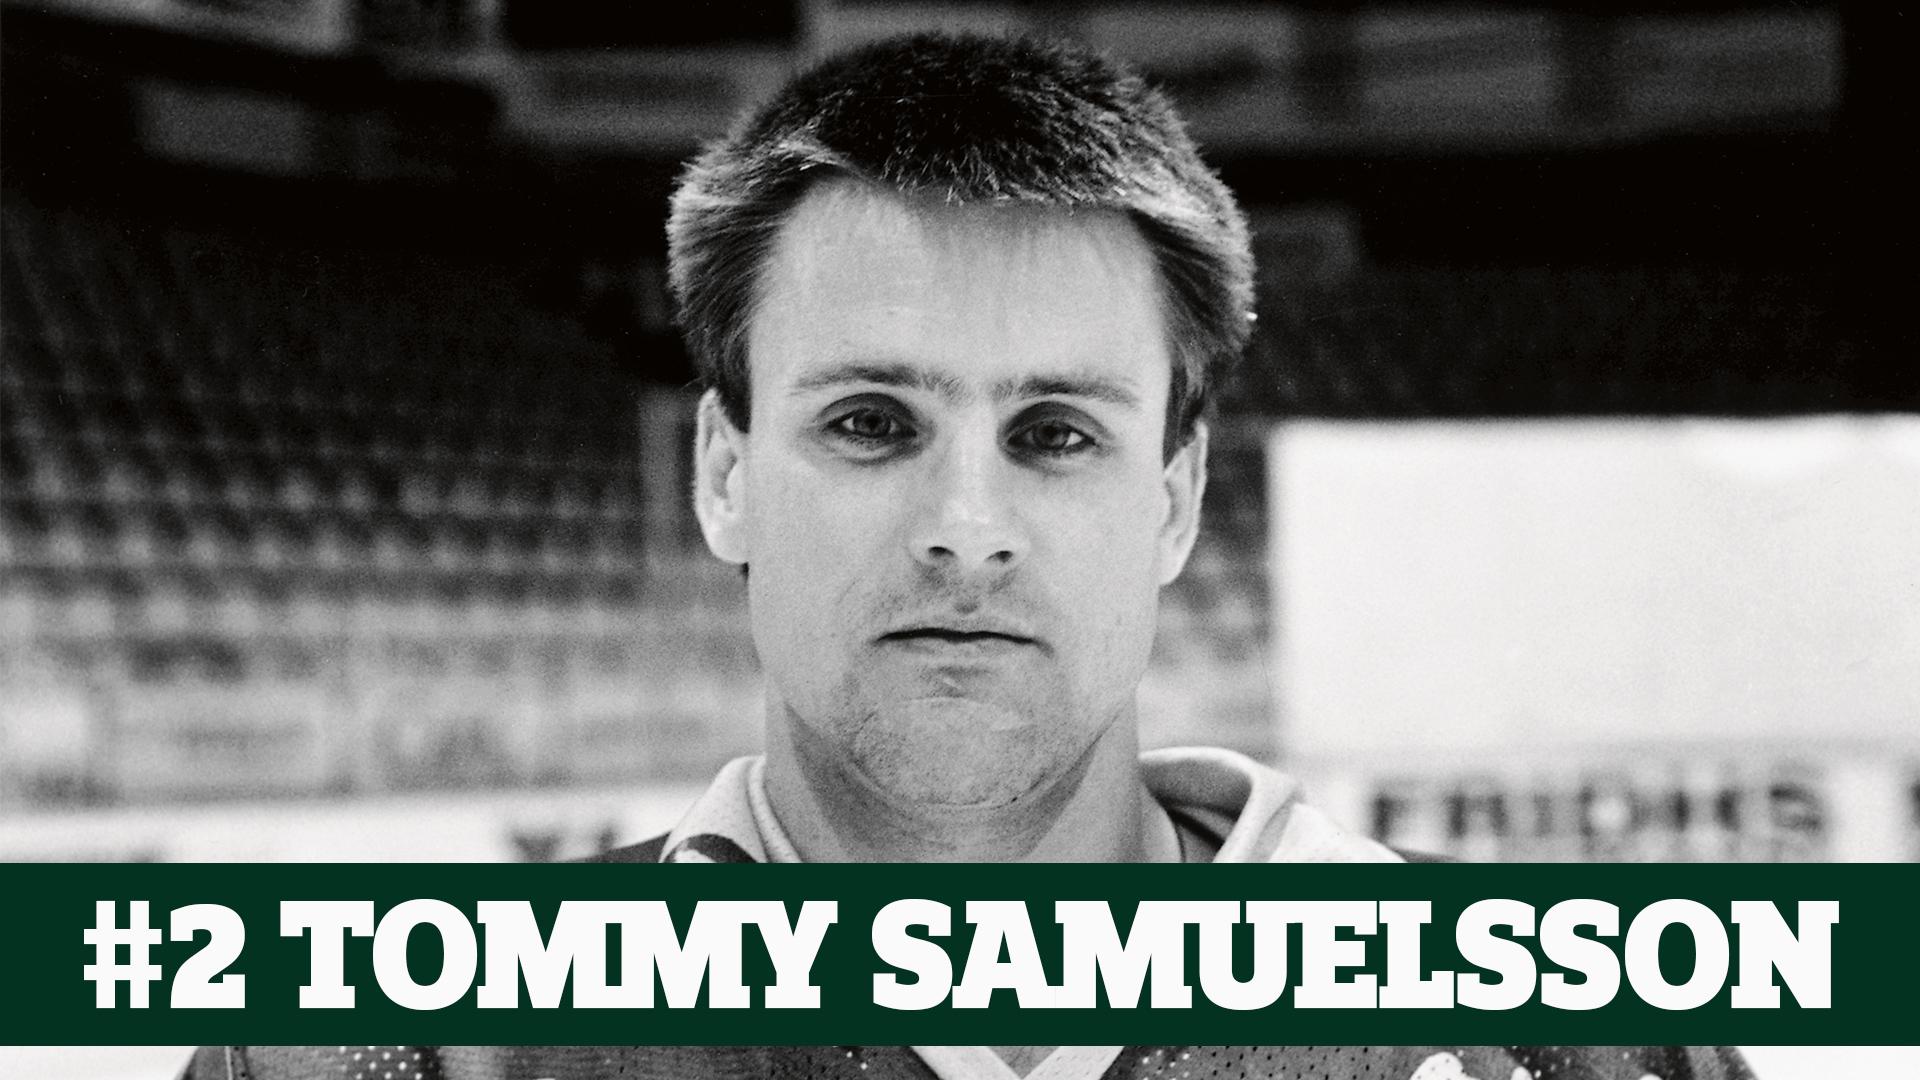 Tommy Samuelsson